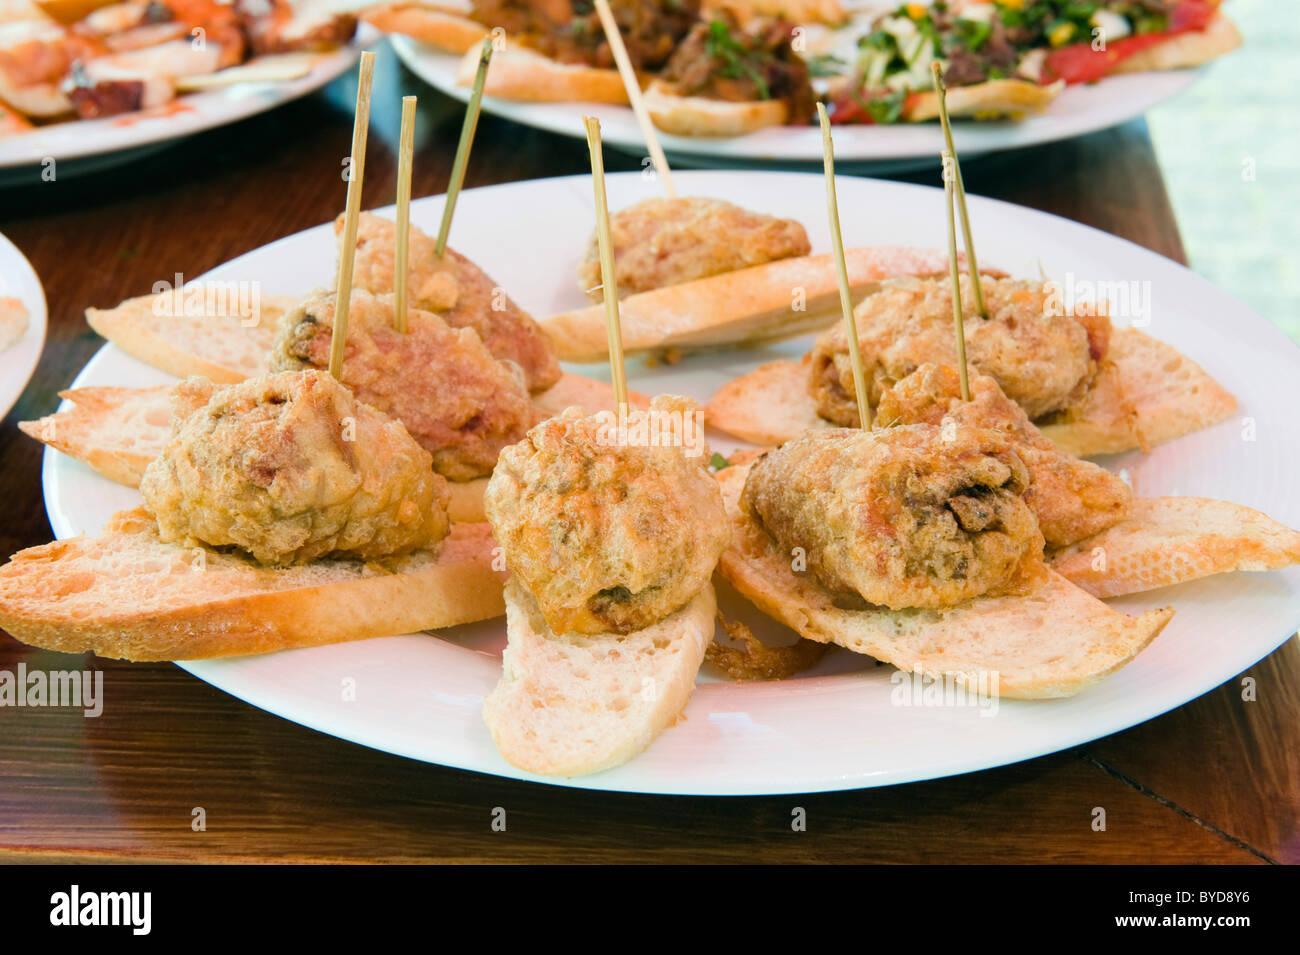 Tapas, Spanish food, Teguise, Lanzarote, Canary Islands, Spain, Europe Stock Photo